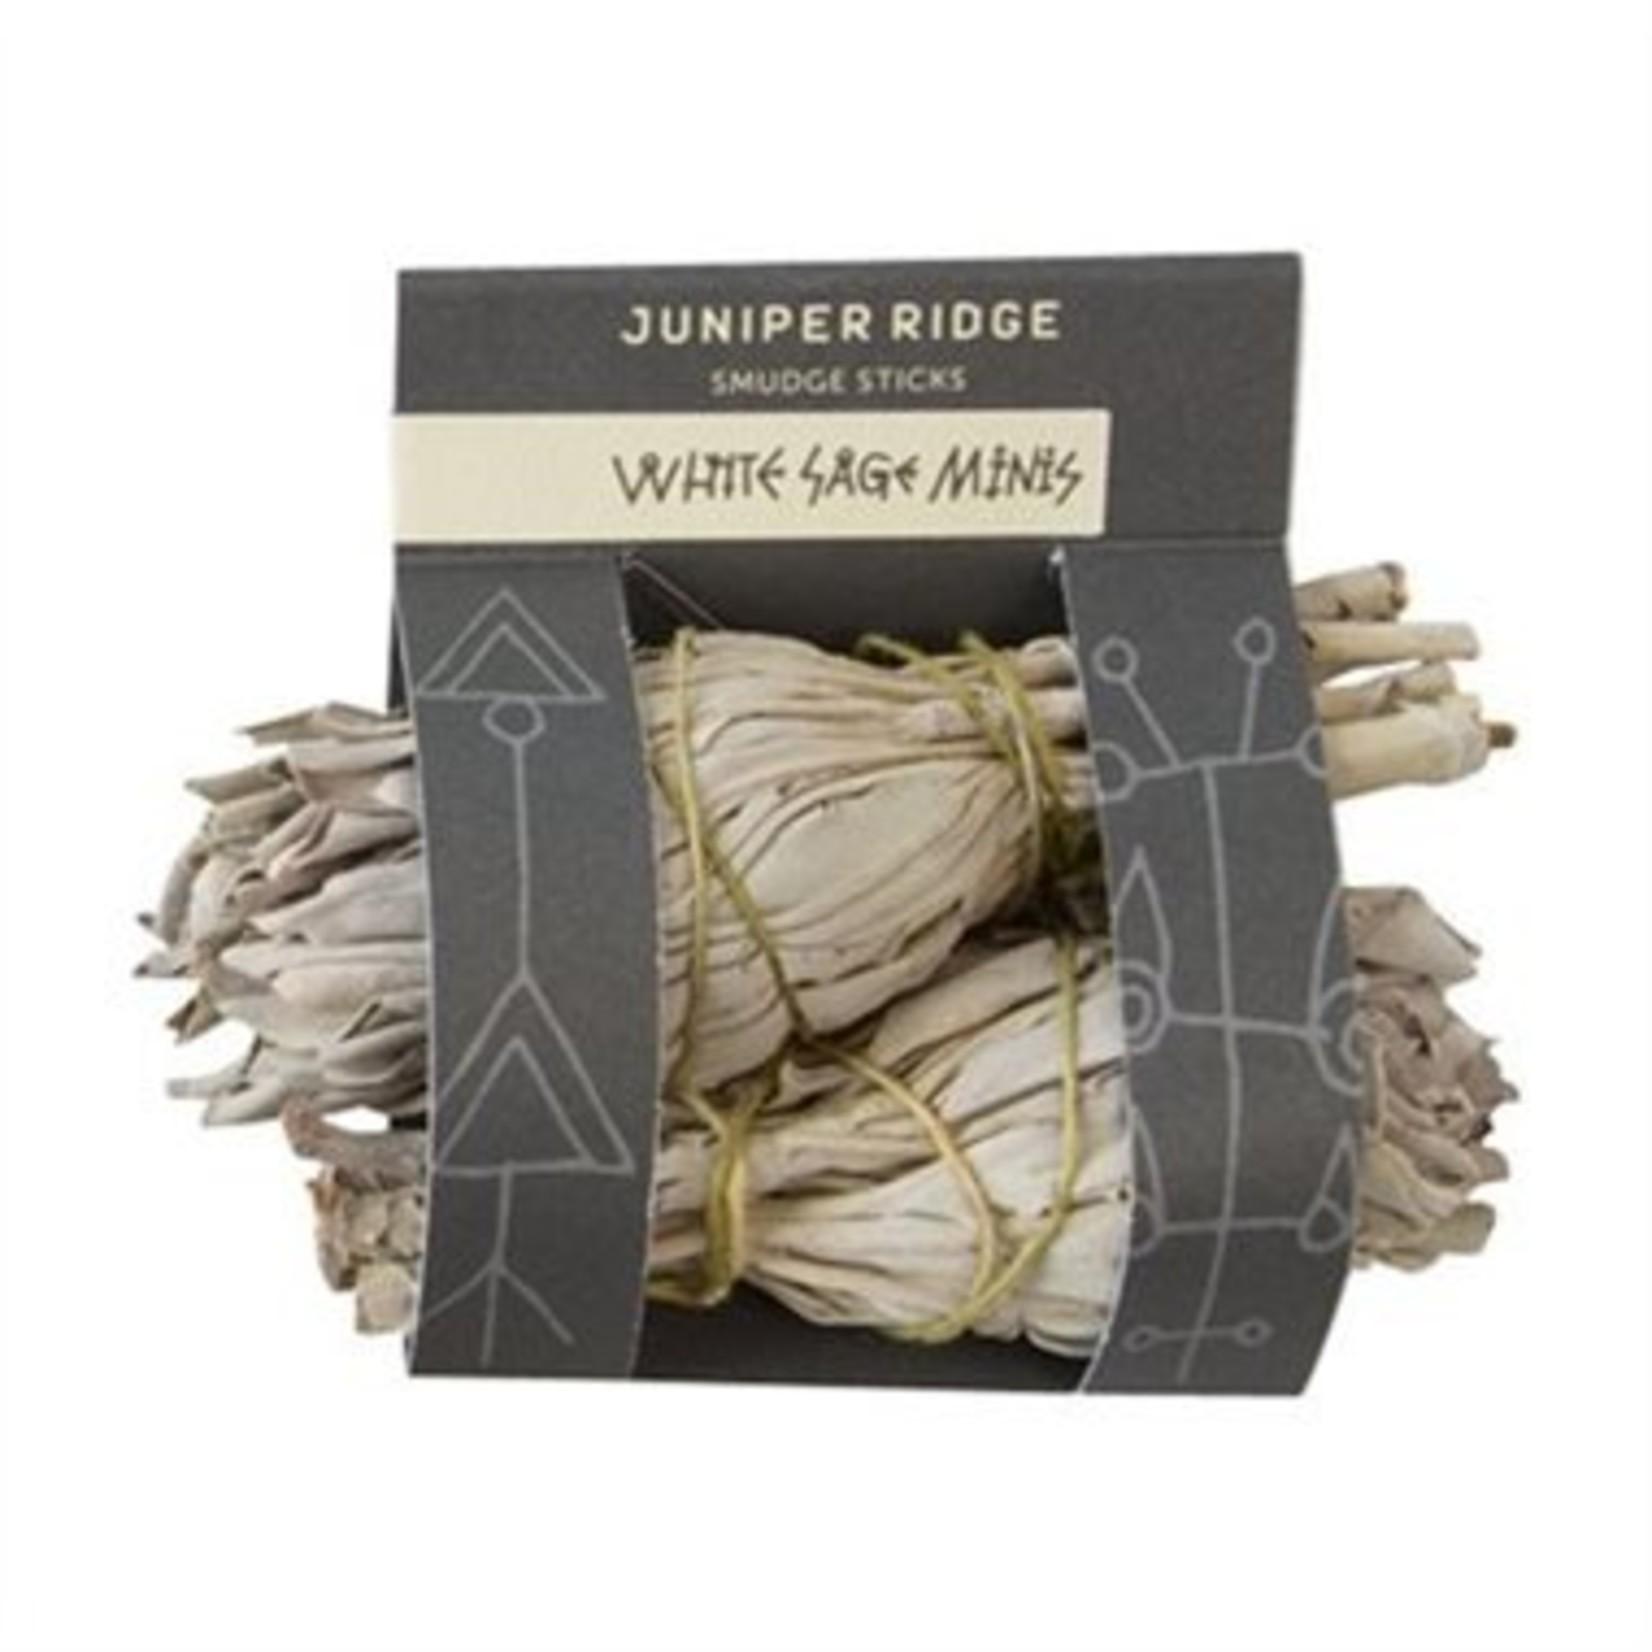 Juniper Ridge Juniper Ridge Smudge Sage Stick Mini 2 Pack